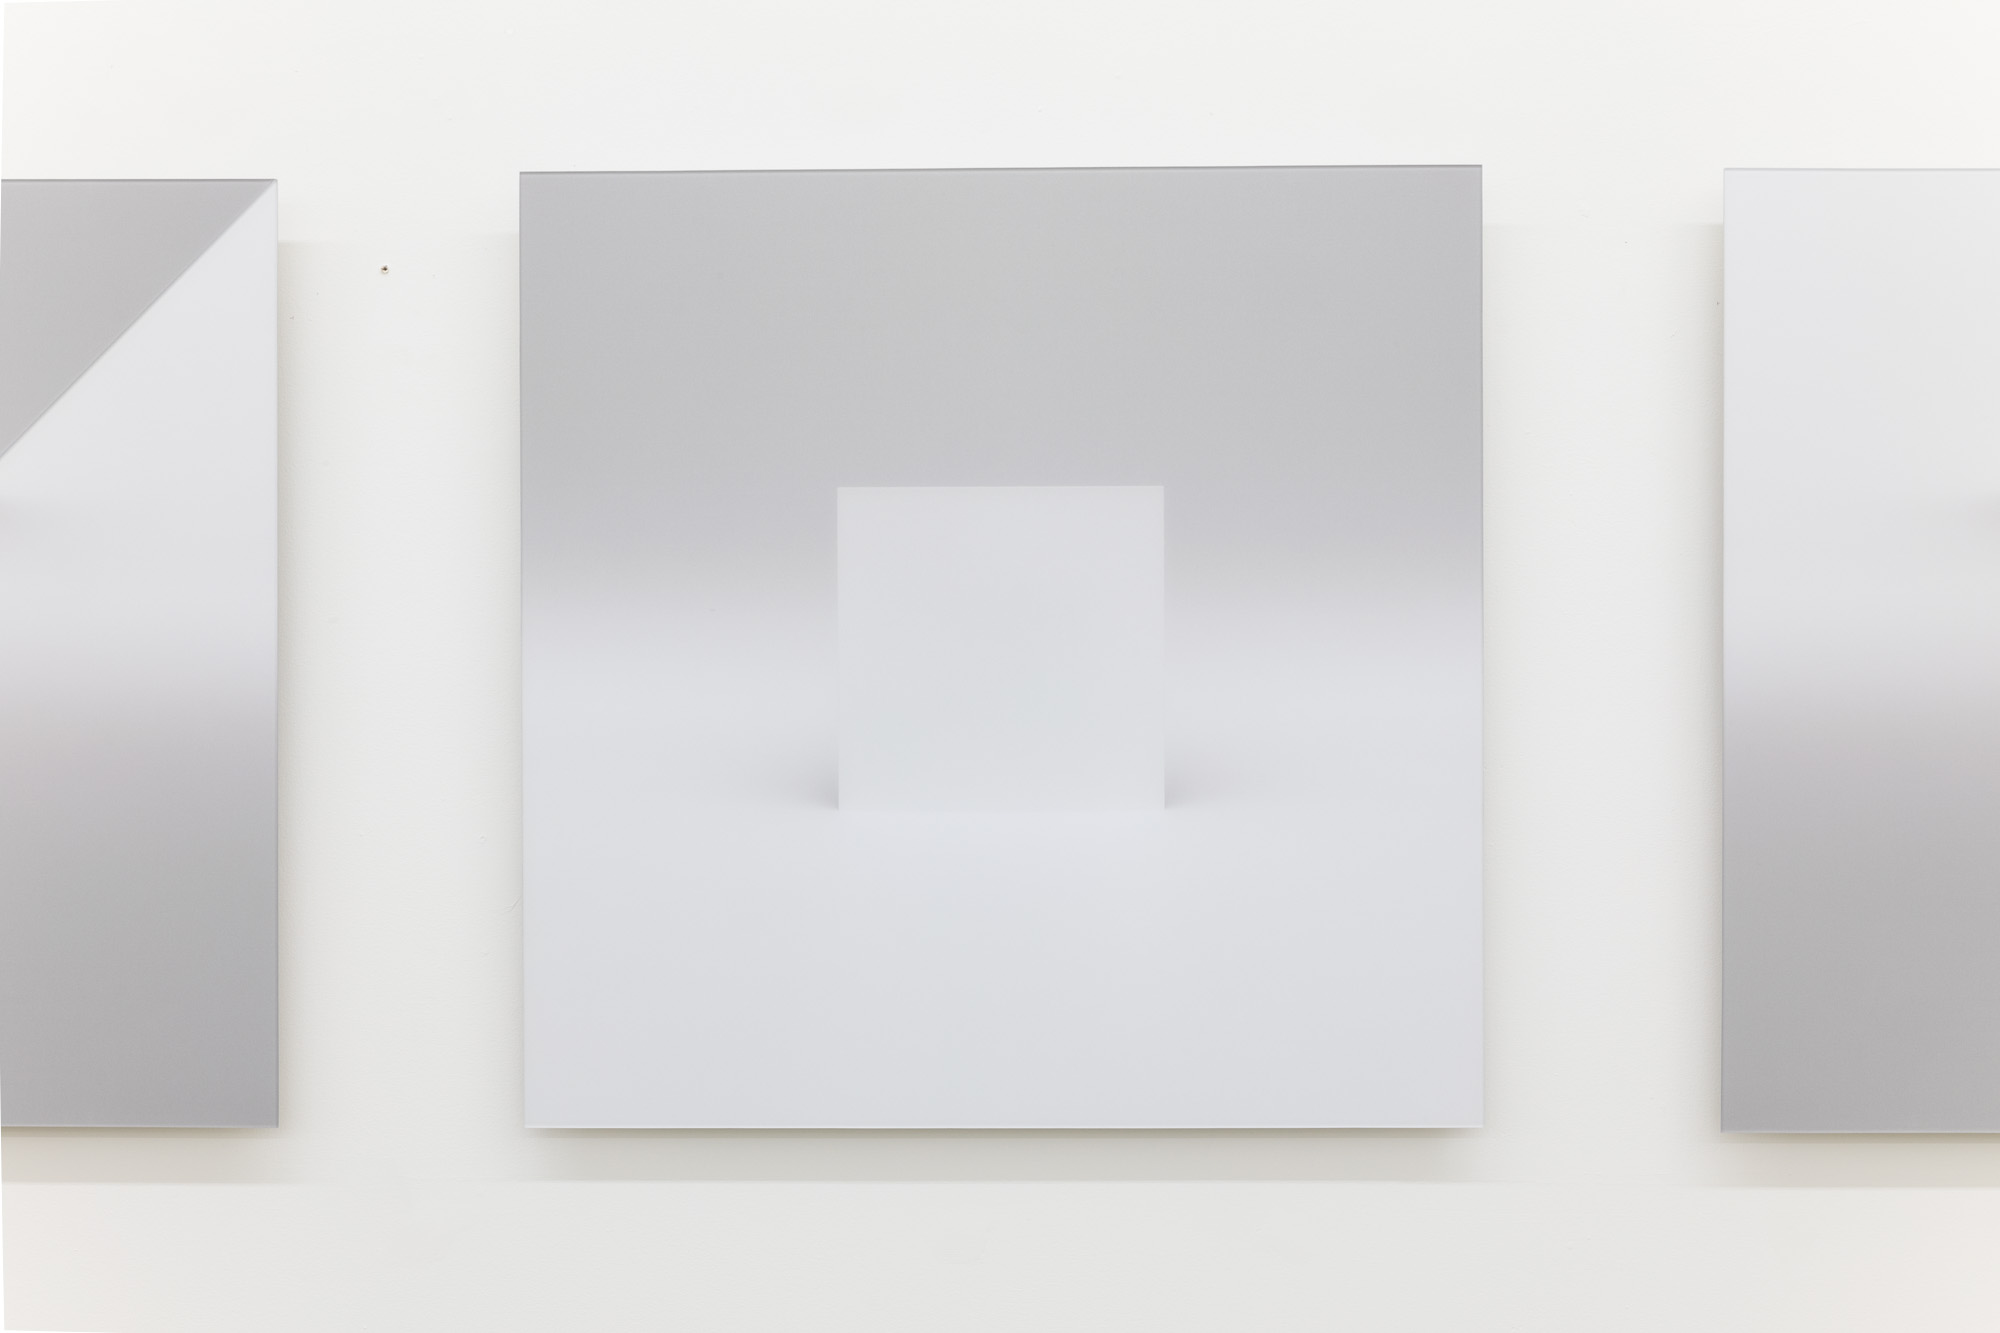 Foire Papier 2018 - Galerie Nicolas Robert